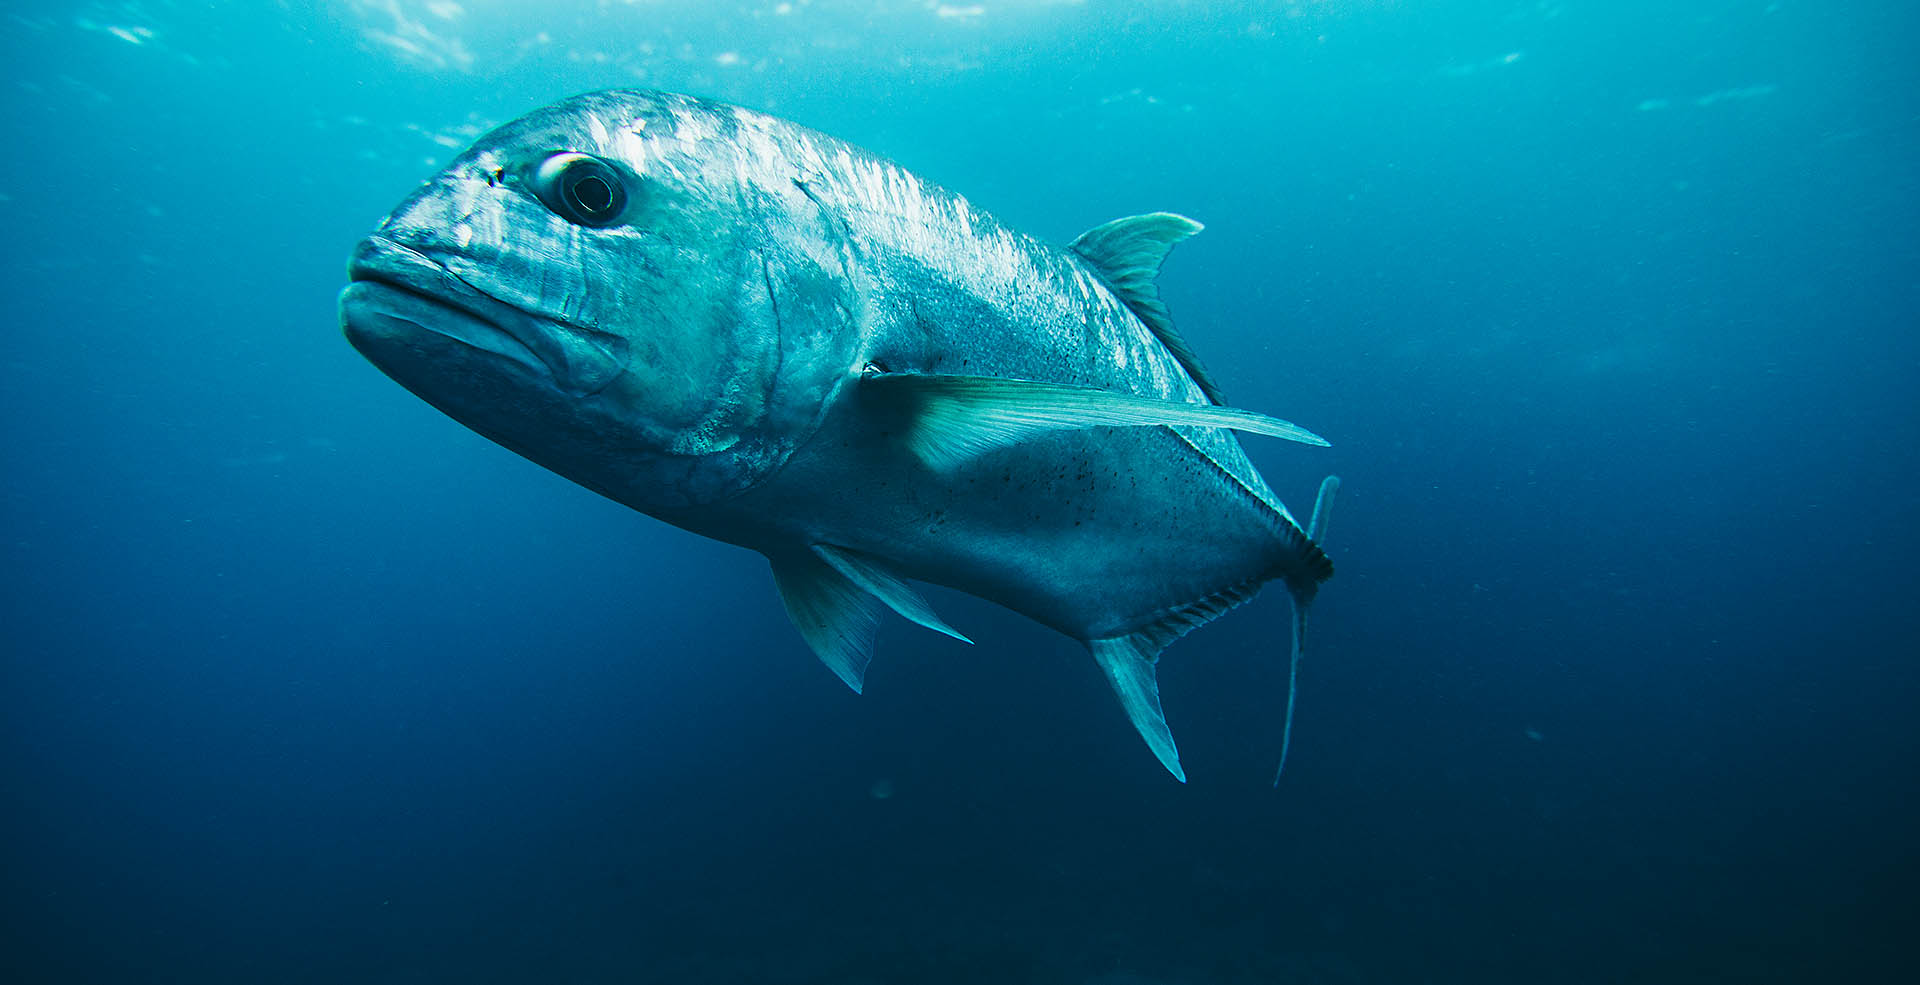 Big Fish Blue Water A Raja Ampat Dive Gallery